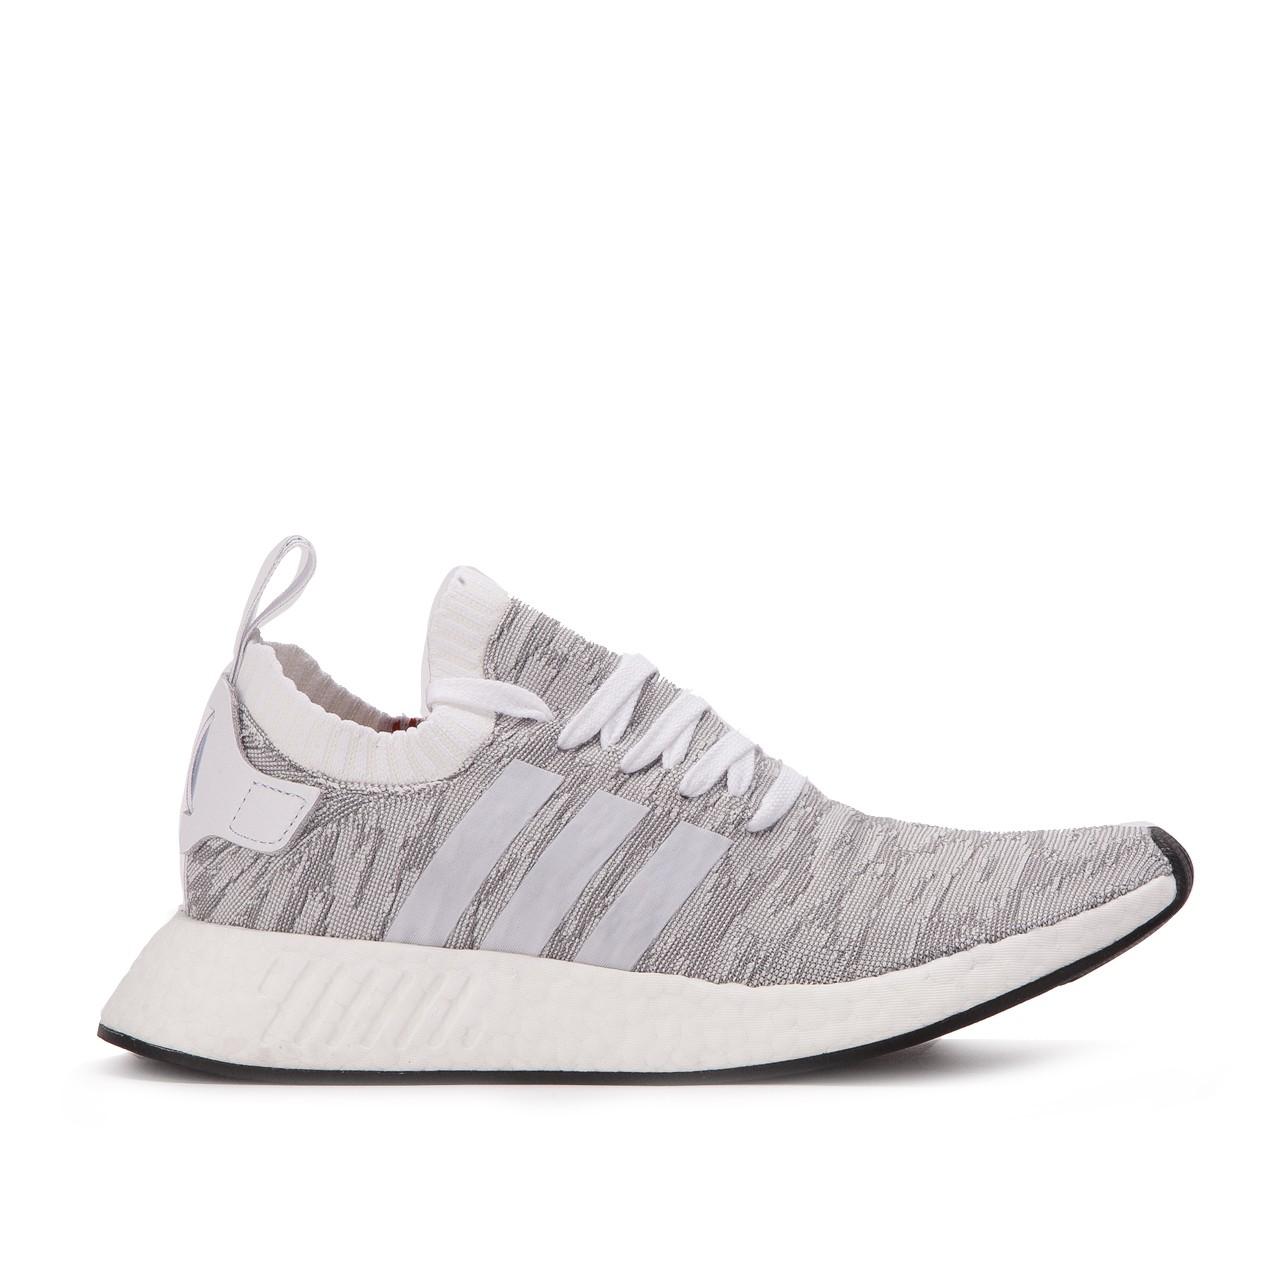 Nowe NMD buty Adidas NMD Nowe R2 Primeknit BY9410 44 2 3 7248721839 855aa2